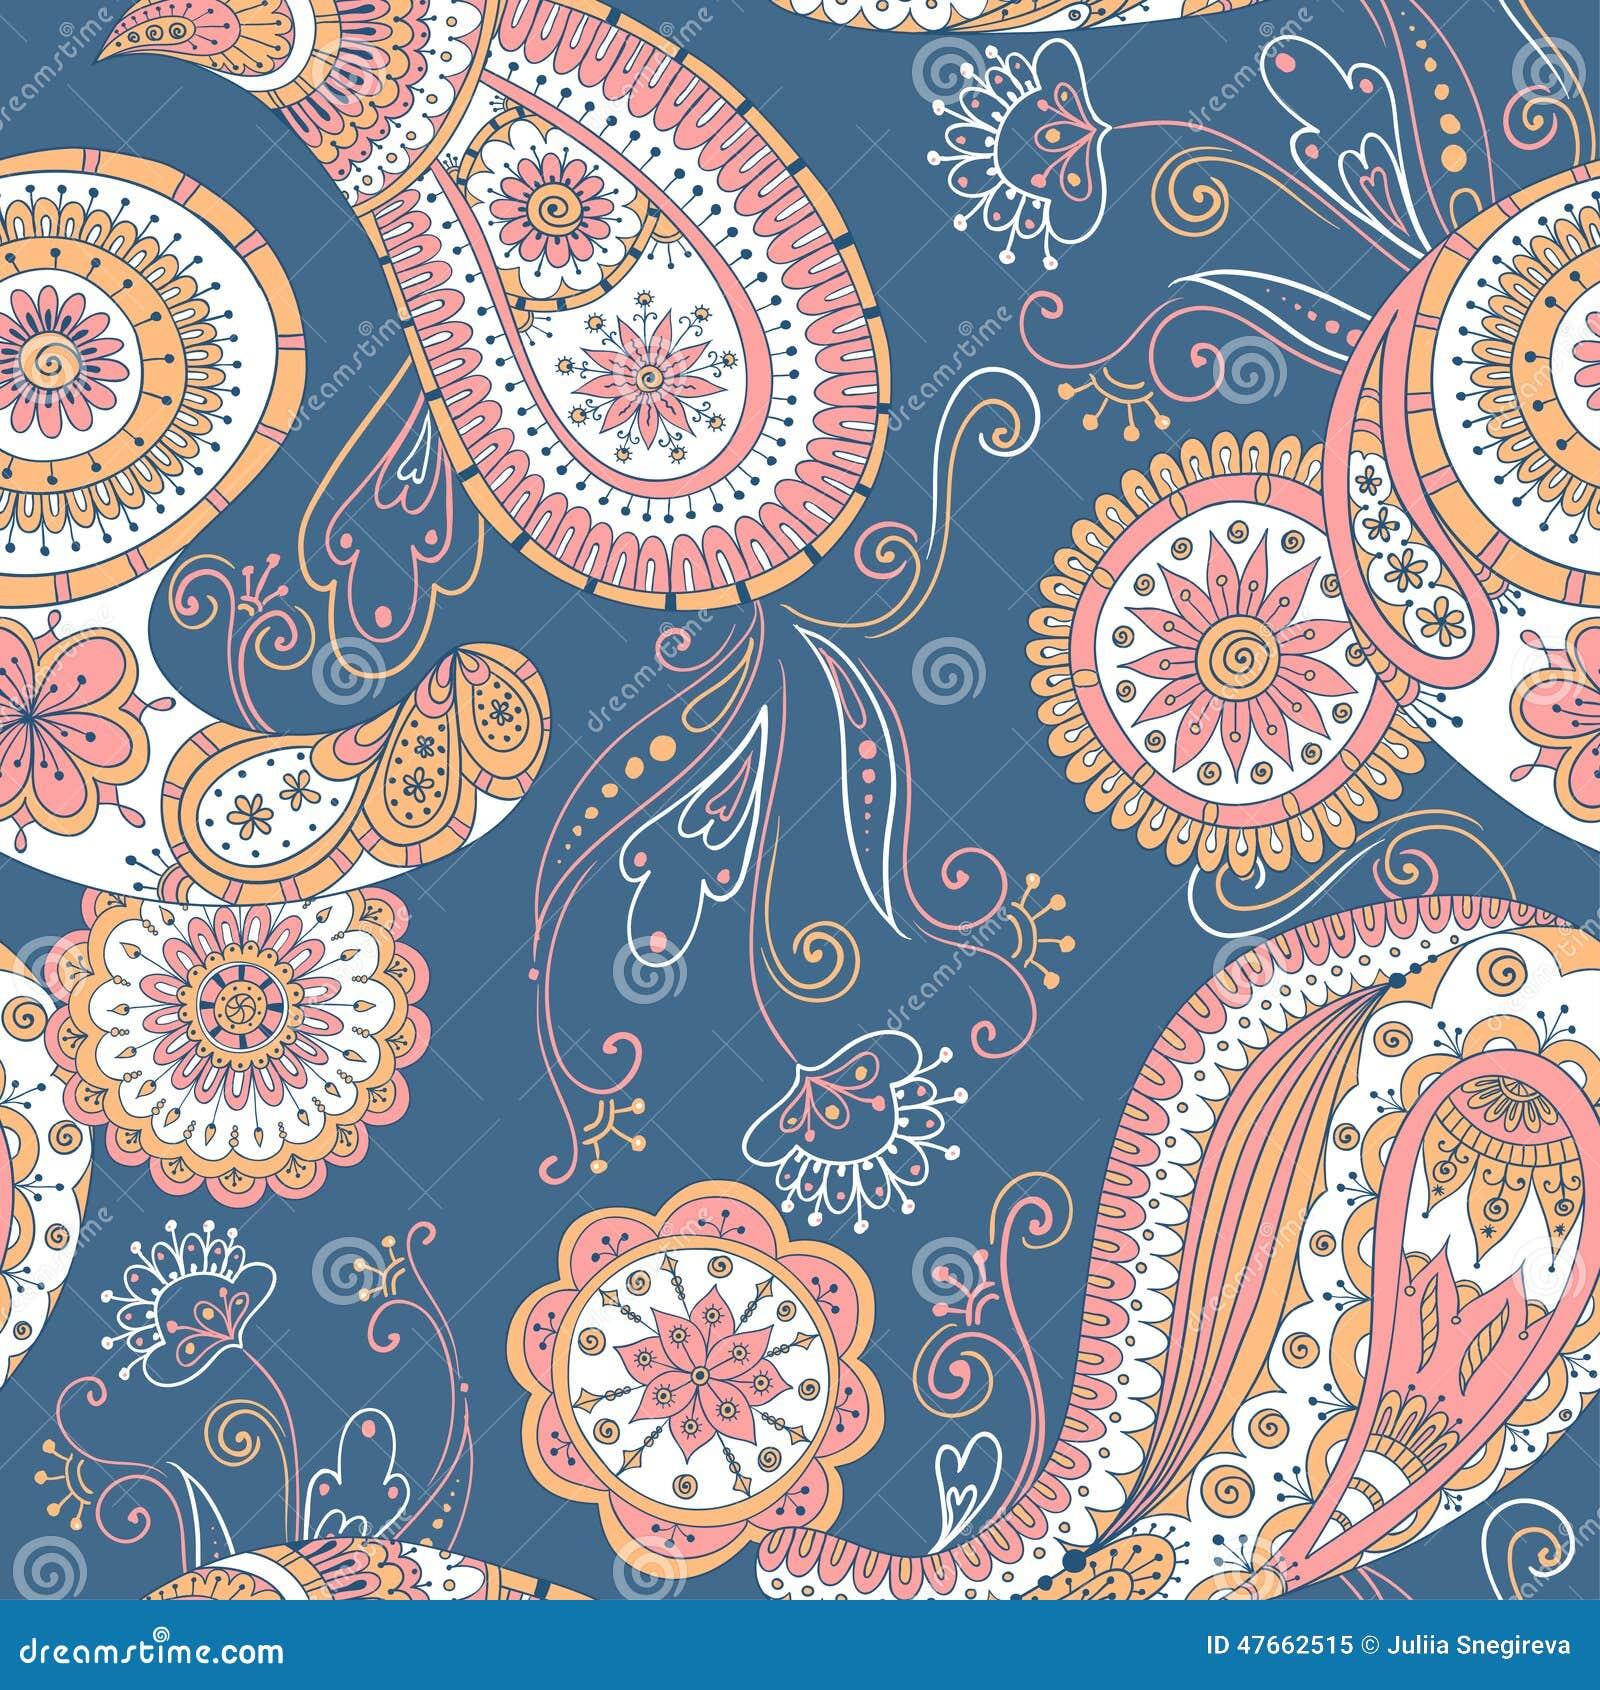 Henna paisley mehndi doodles asian design pattern stock vector image 47662515 - Asian design ...